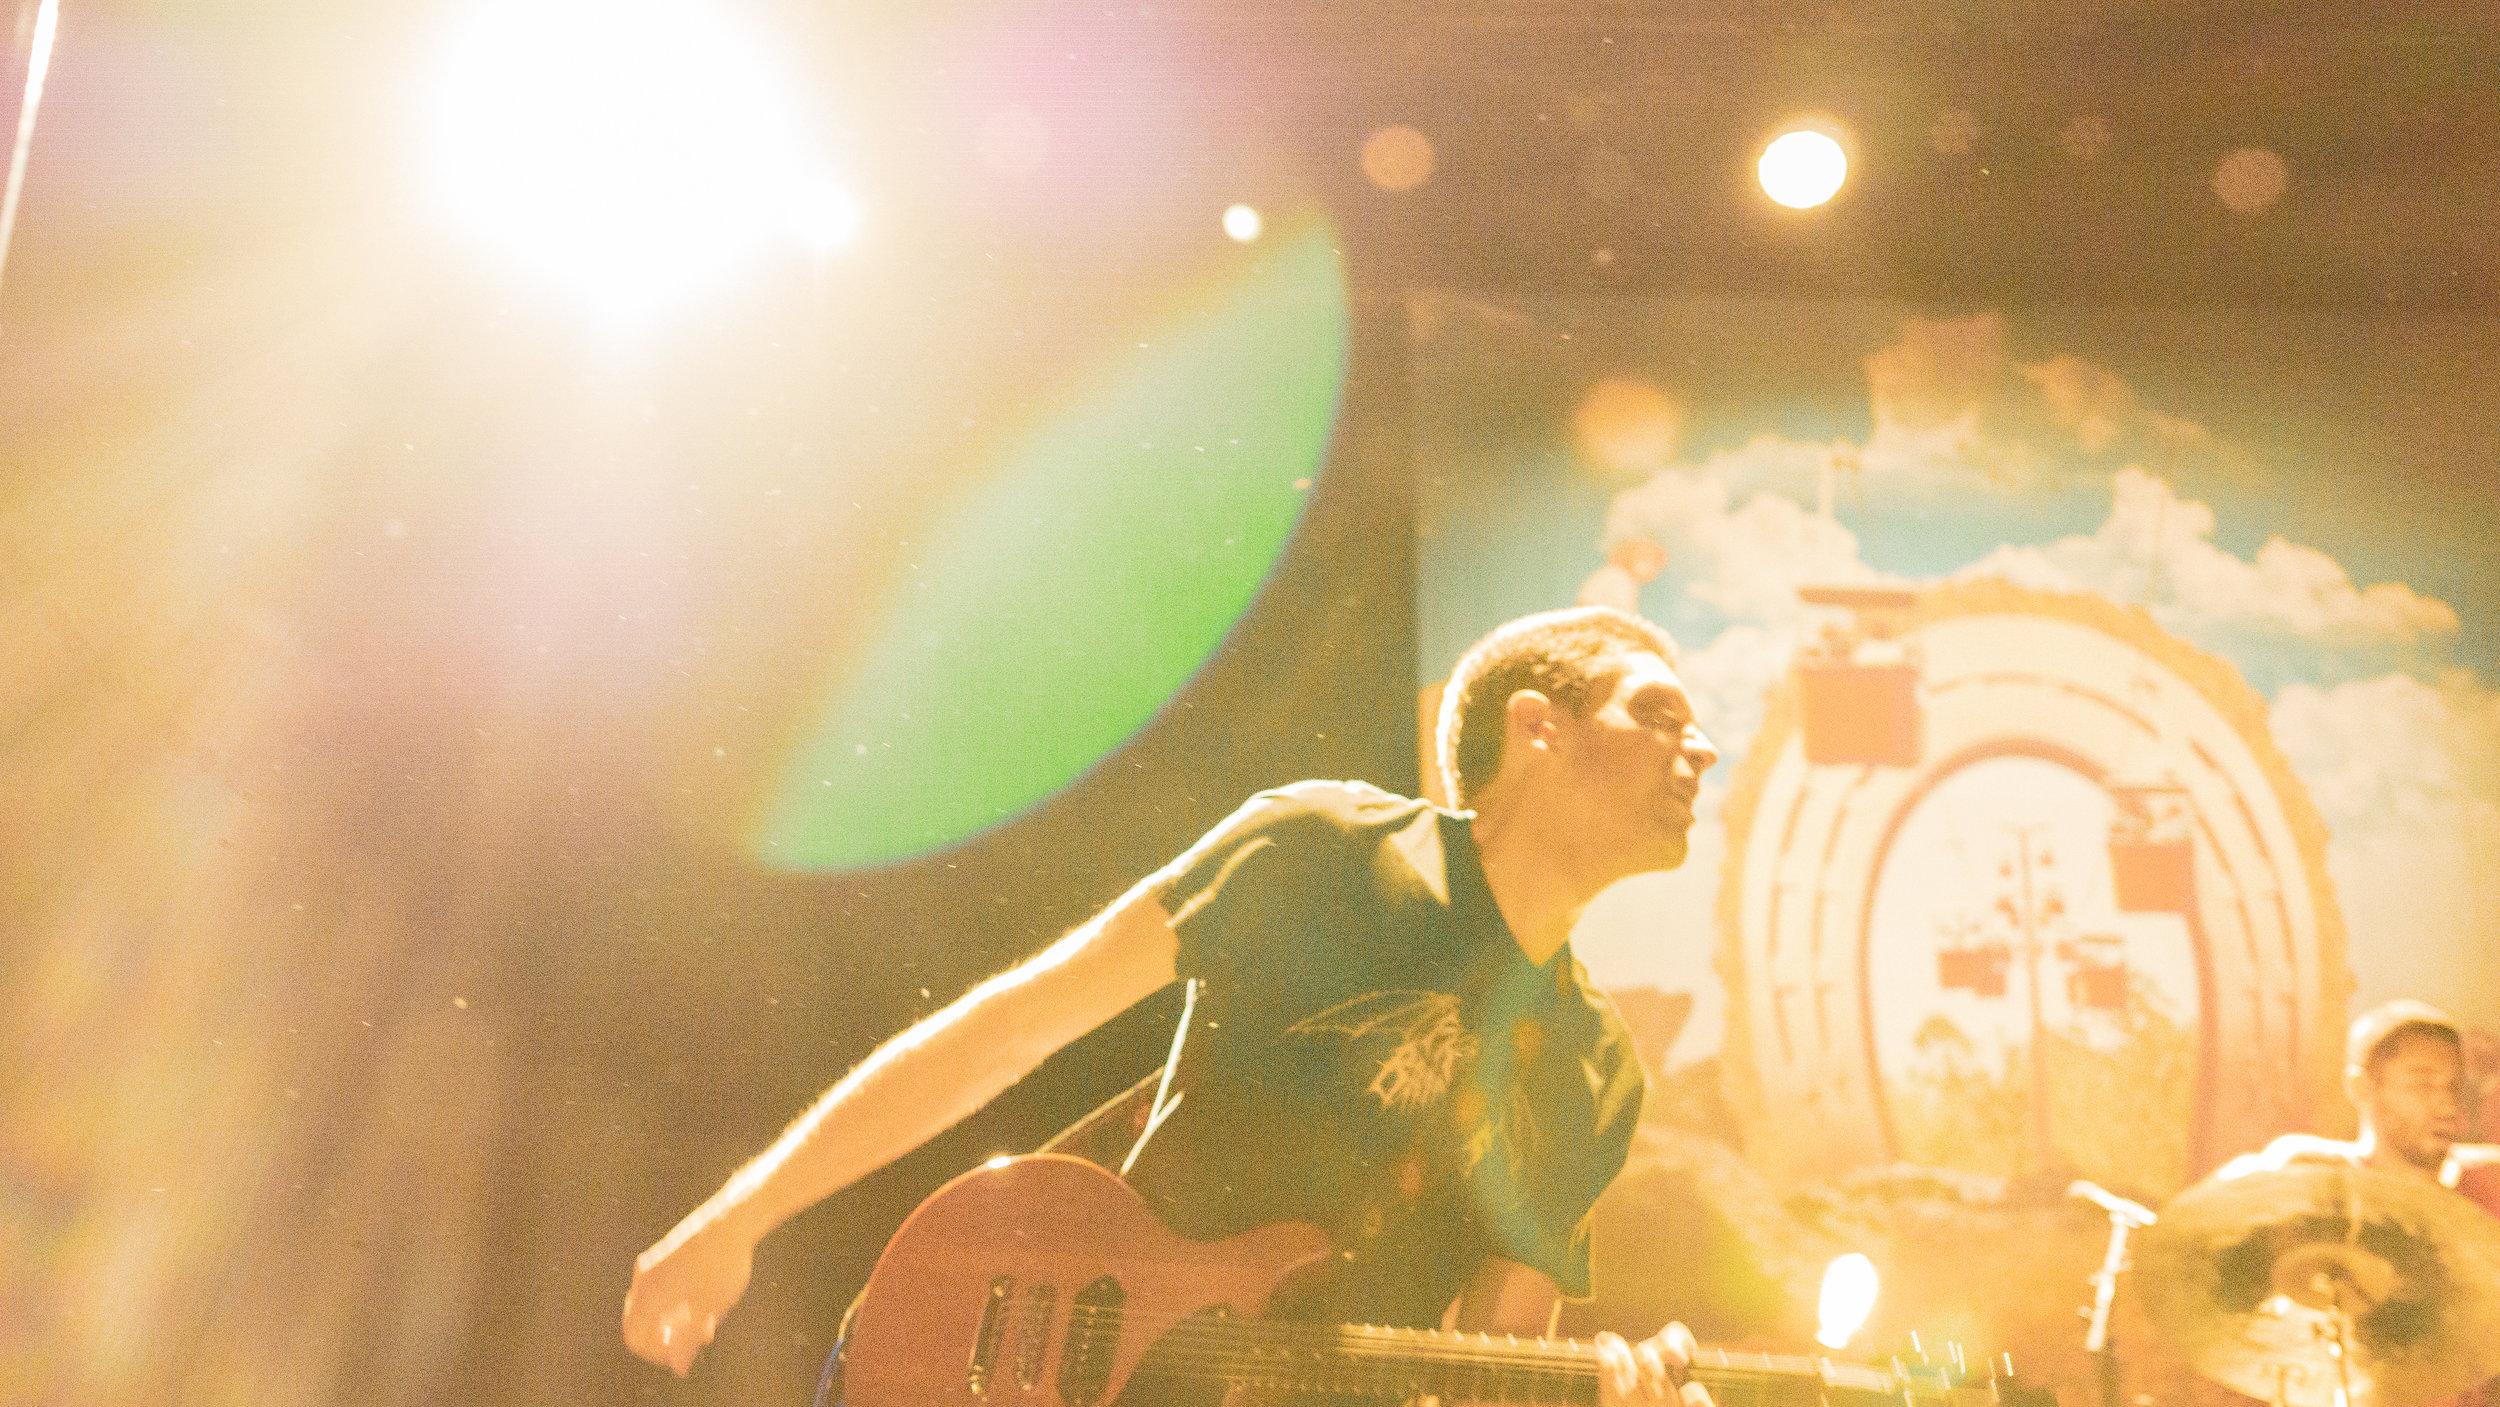 Photographer: Josh Fewtrell